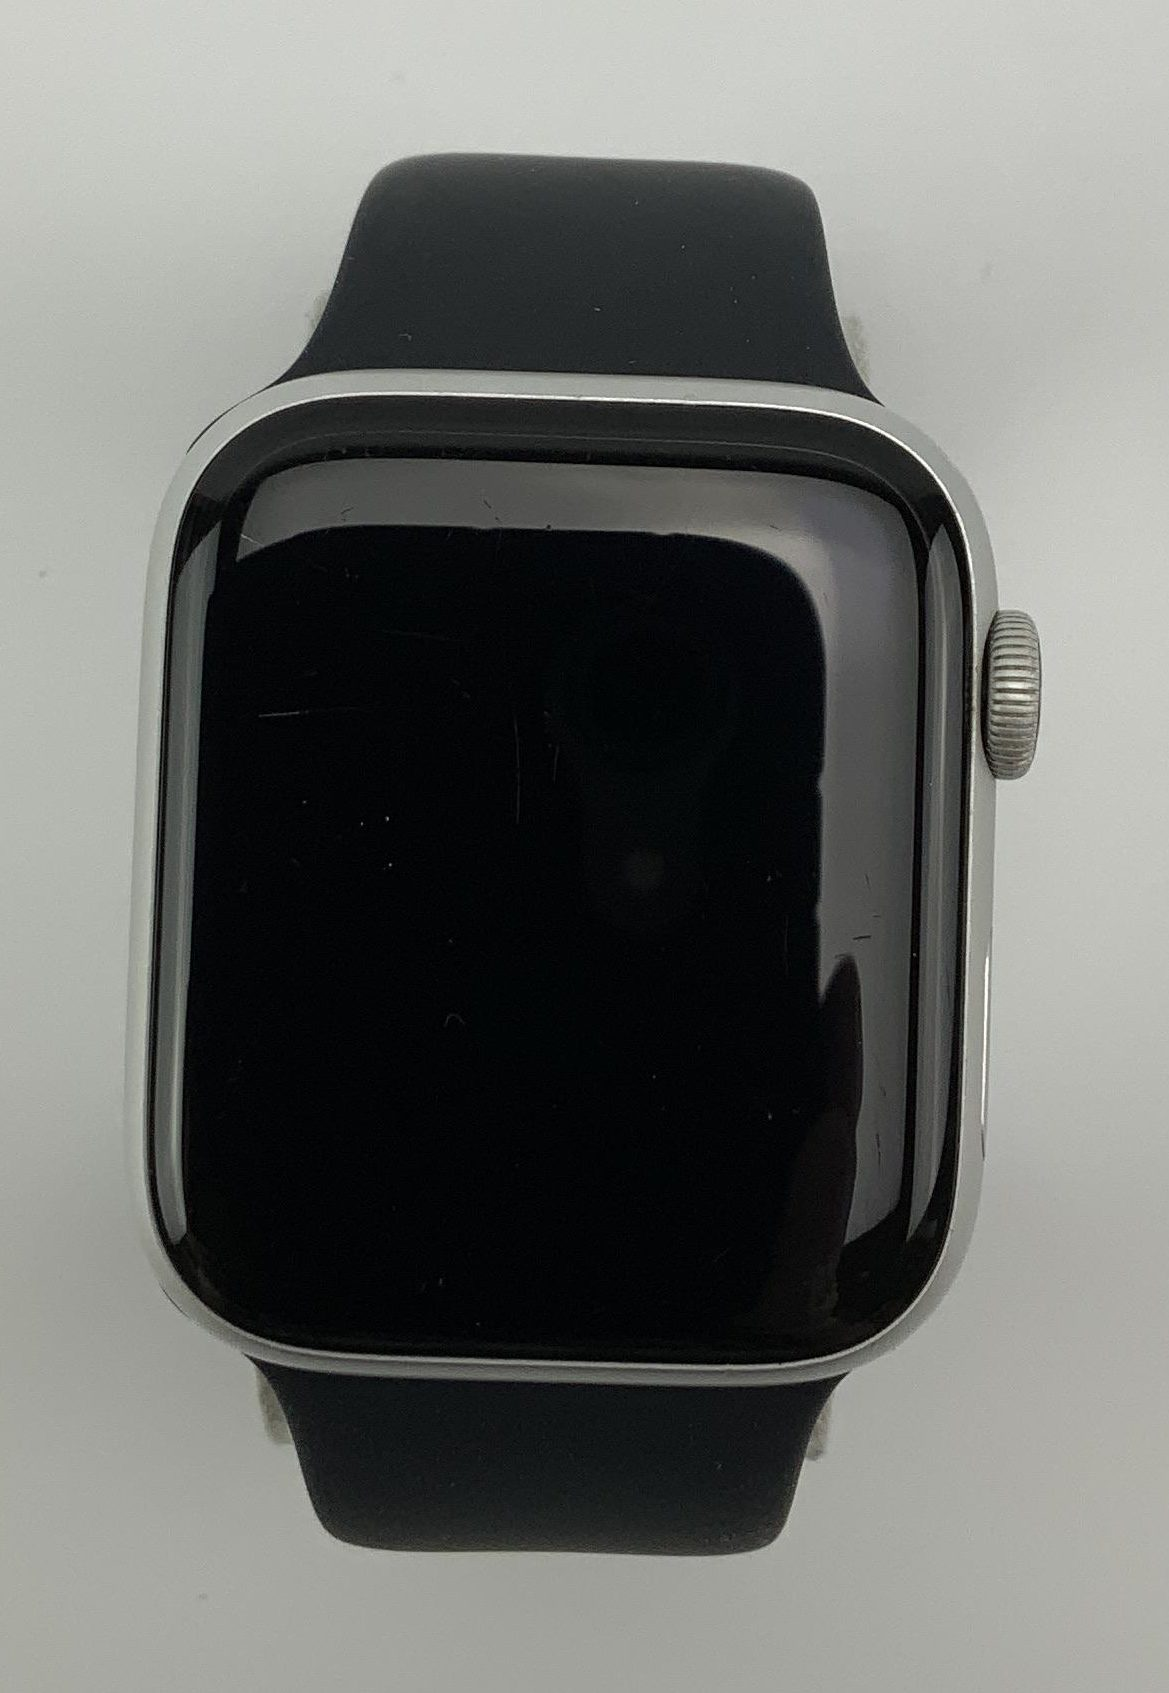 Watch Series 4 Aluminum (44mm), Silver, Black Sport Band, Kuva 1